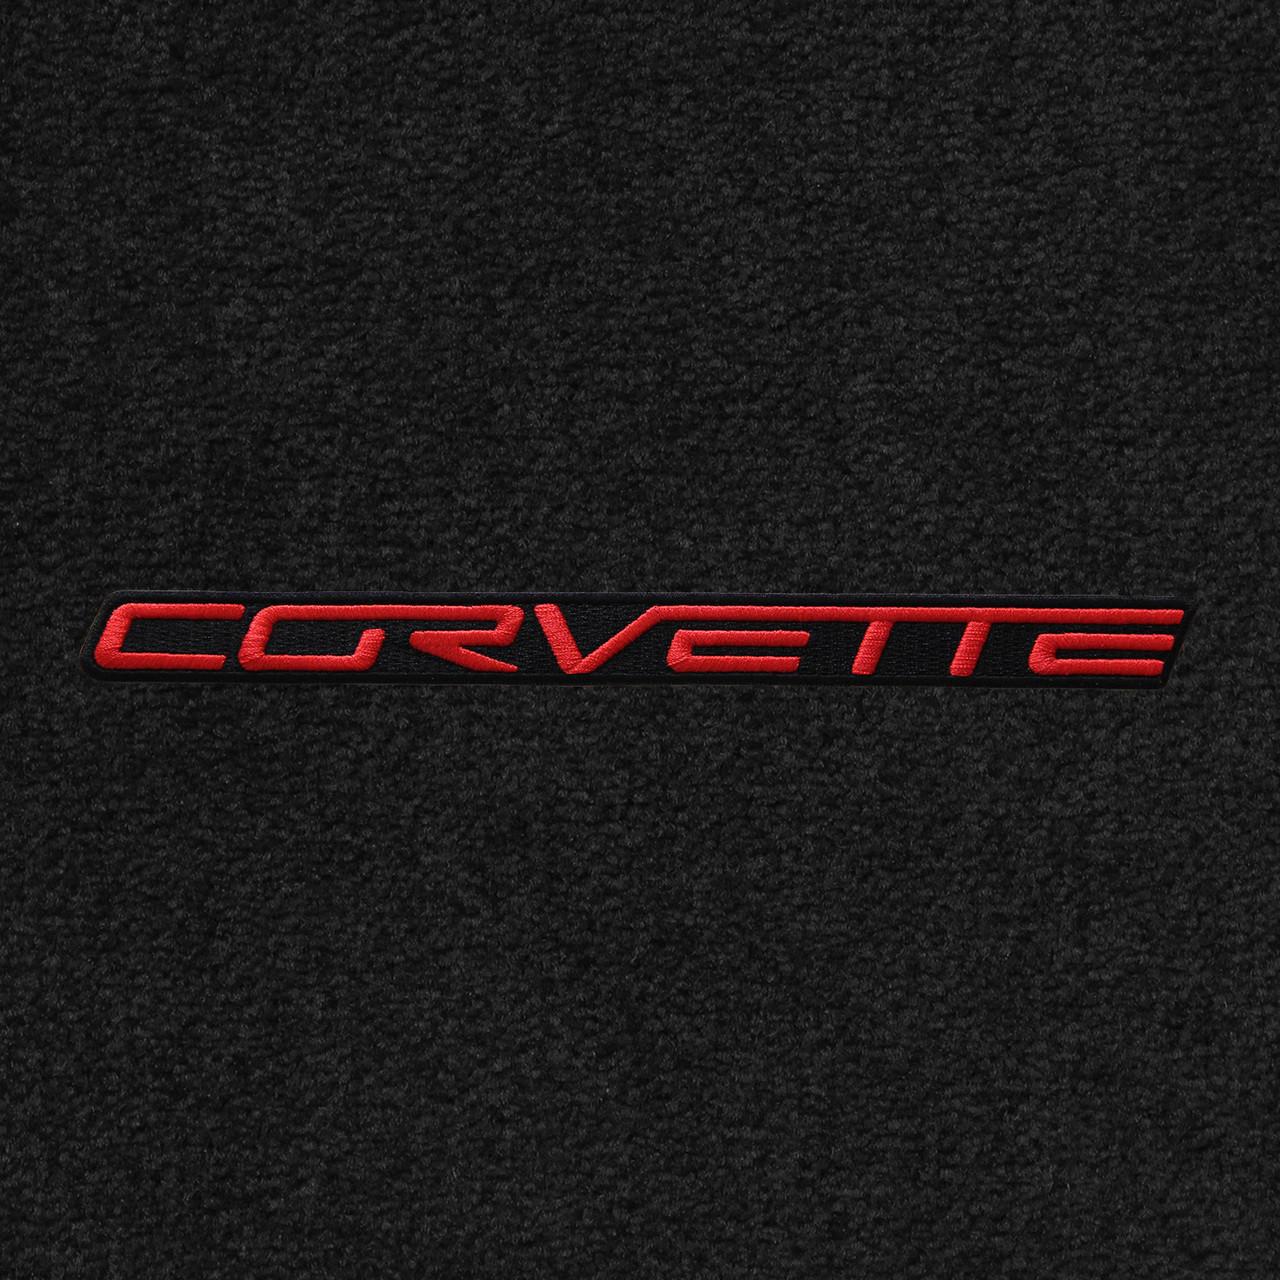 C6 Red Lettering, Black Background on Ebony Mat